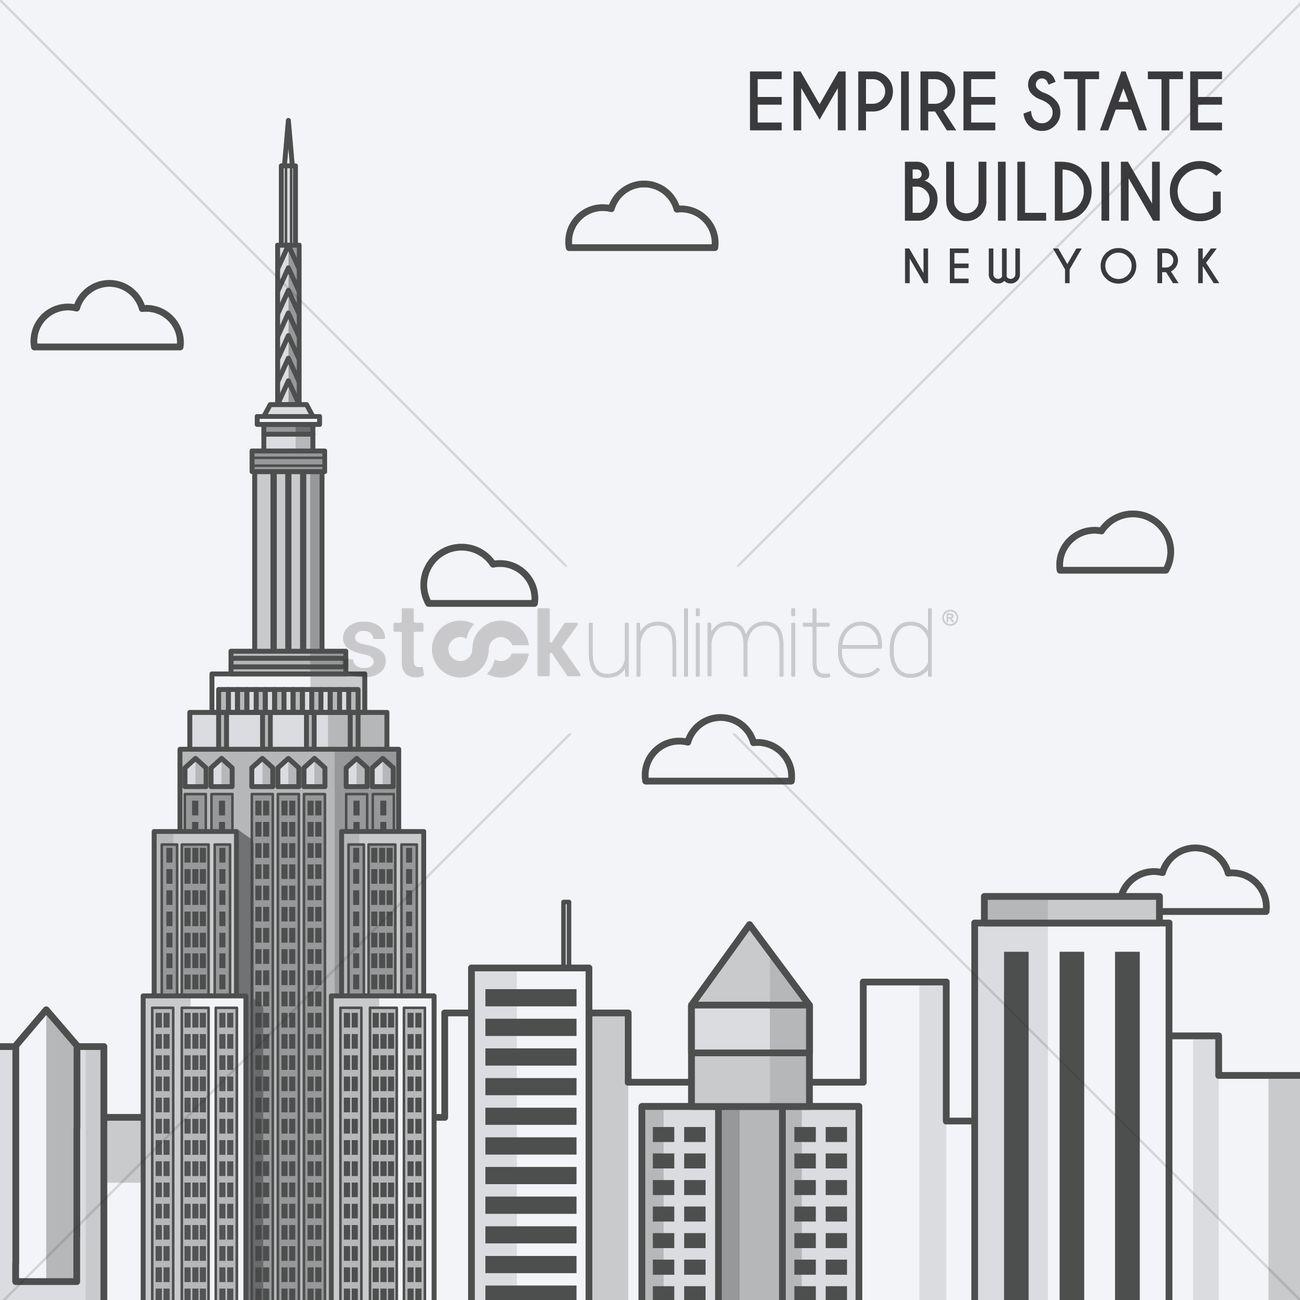 Empire state building - new york, new york